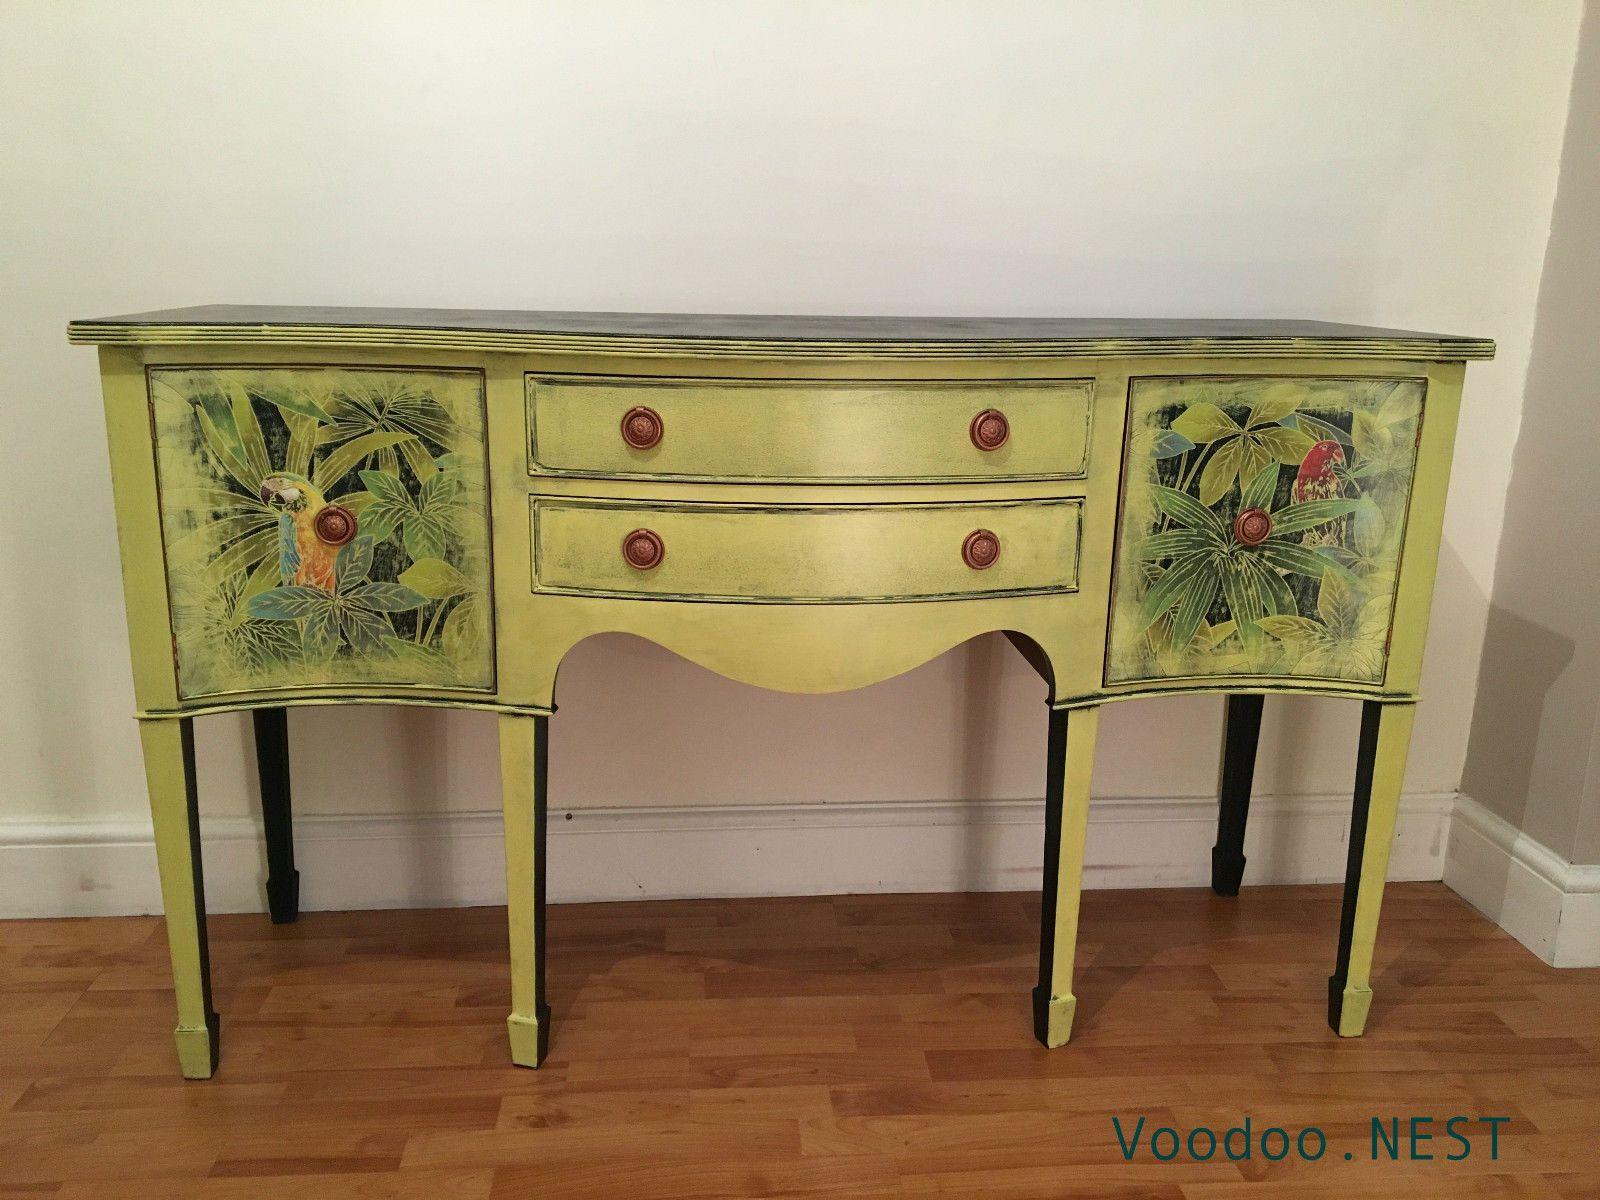 Delightful Upcycled Regency Georgian Style Sideboard Buffet Cabinet   Yellow Shabby  Chic | EBay